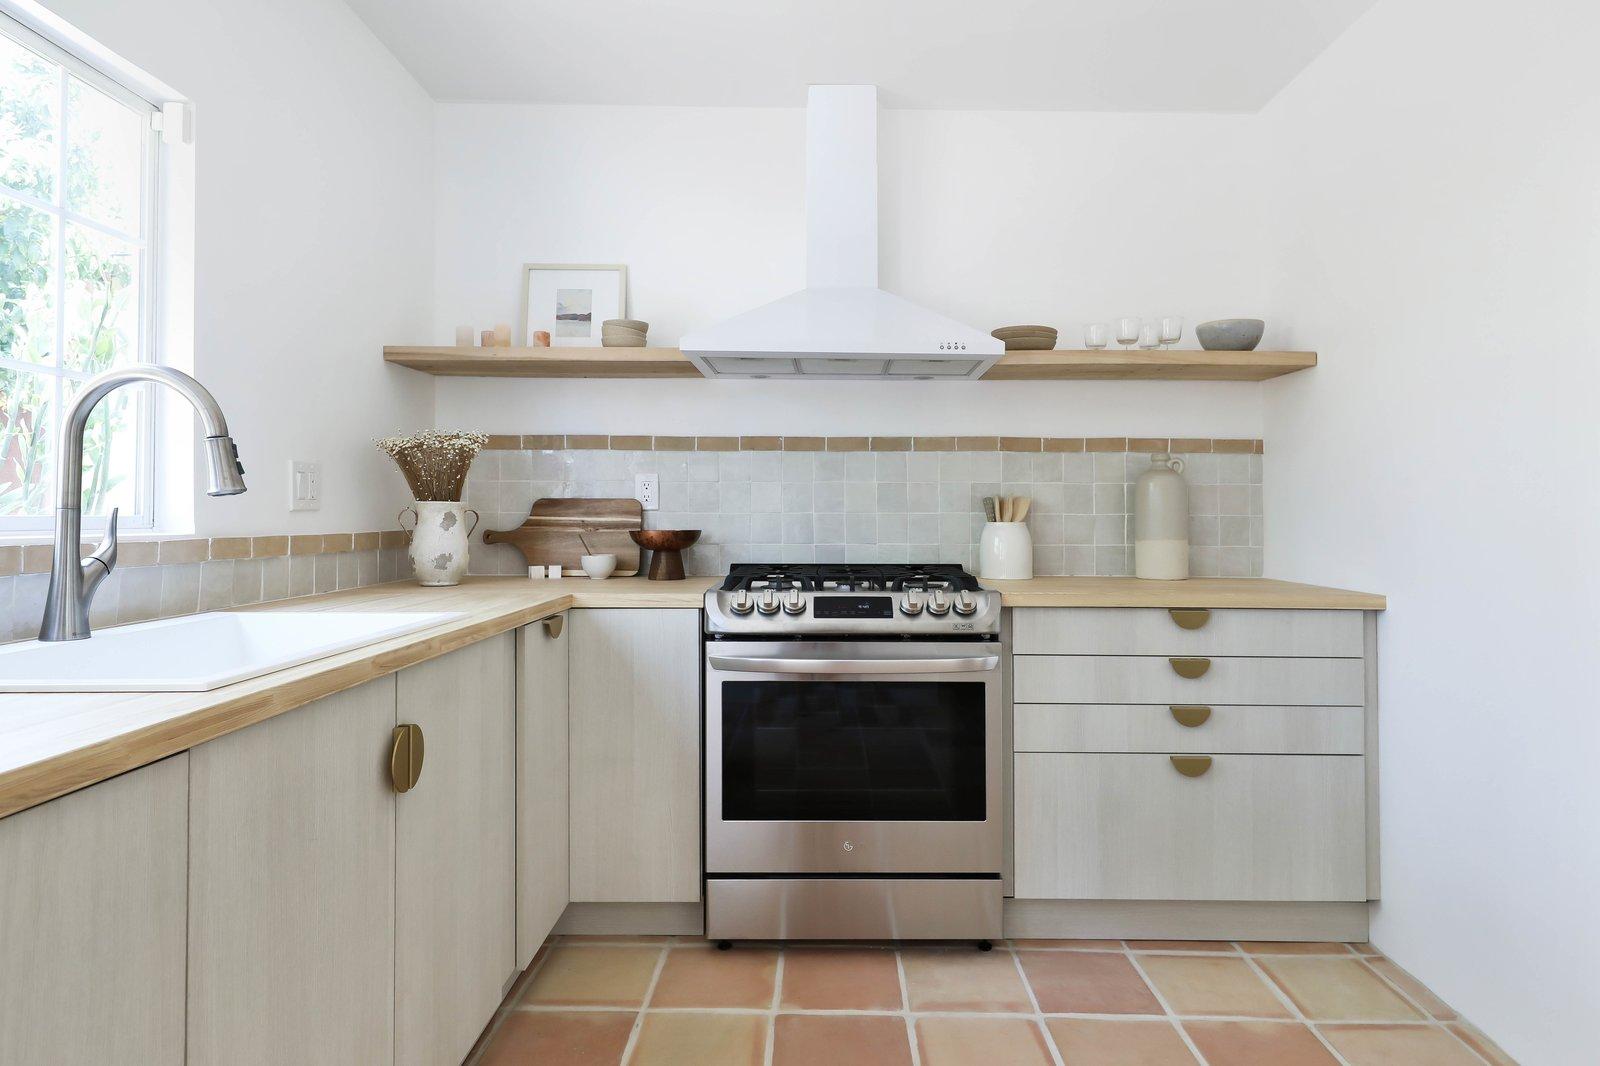 Los Angeles Spanish Bungalow kitchen